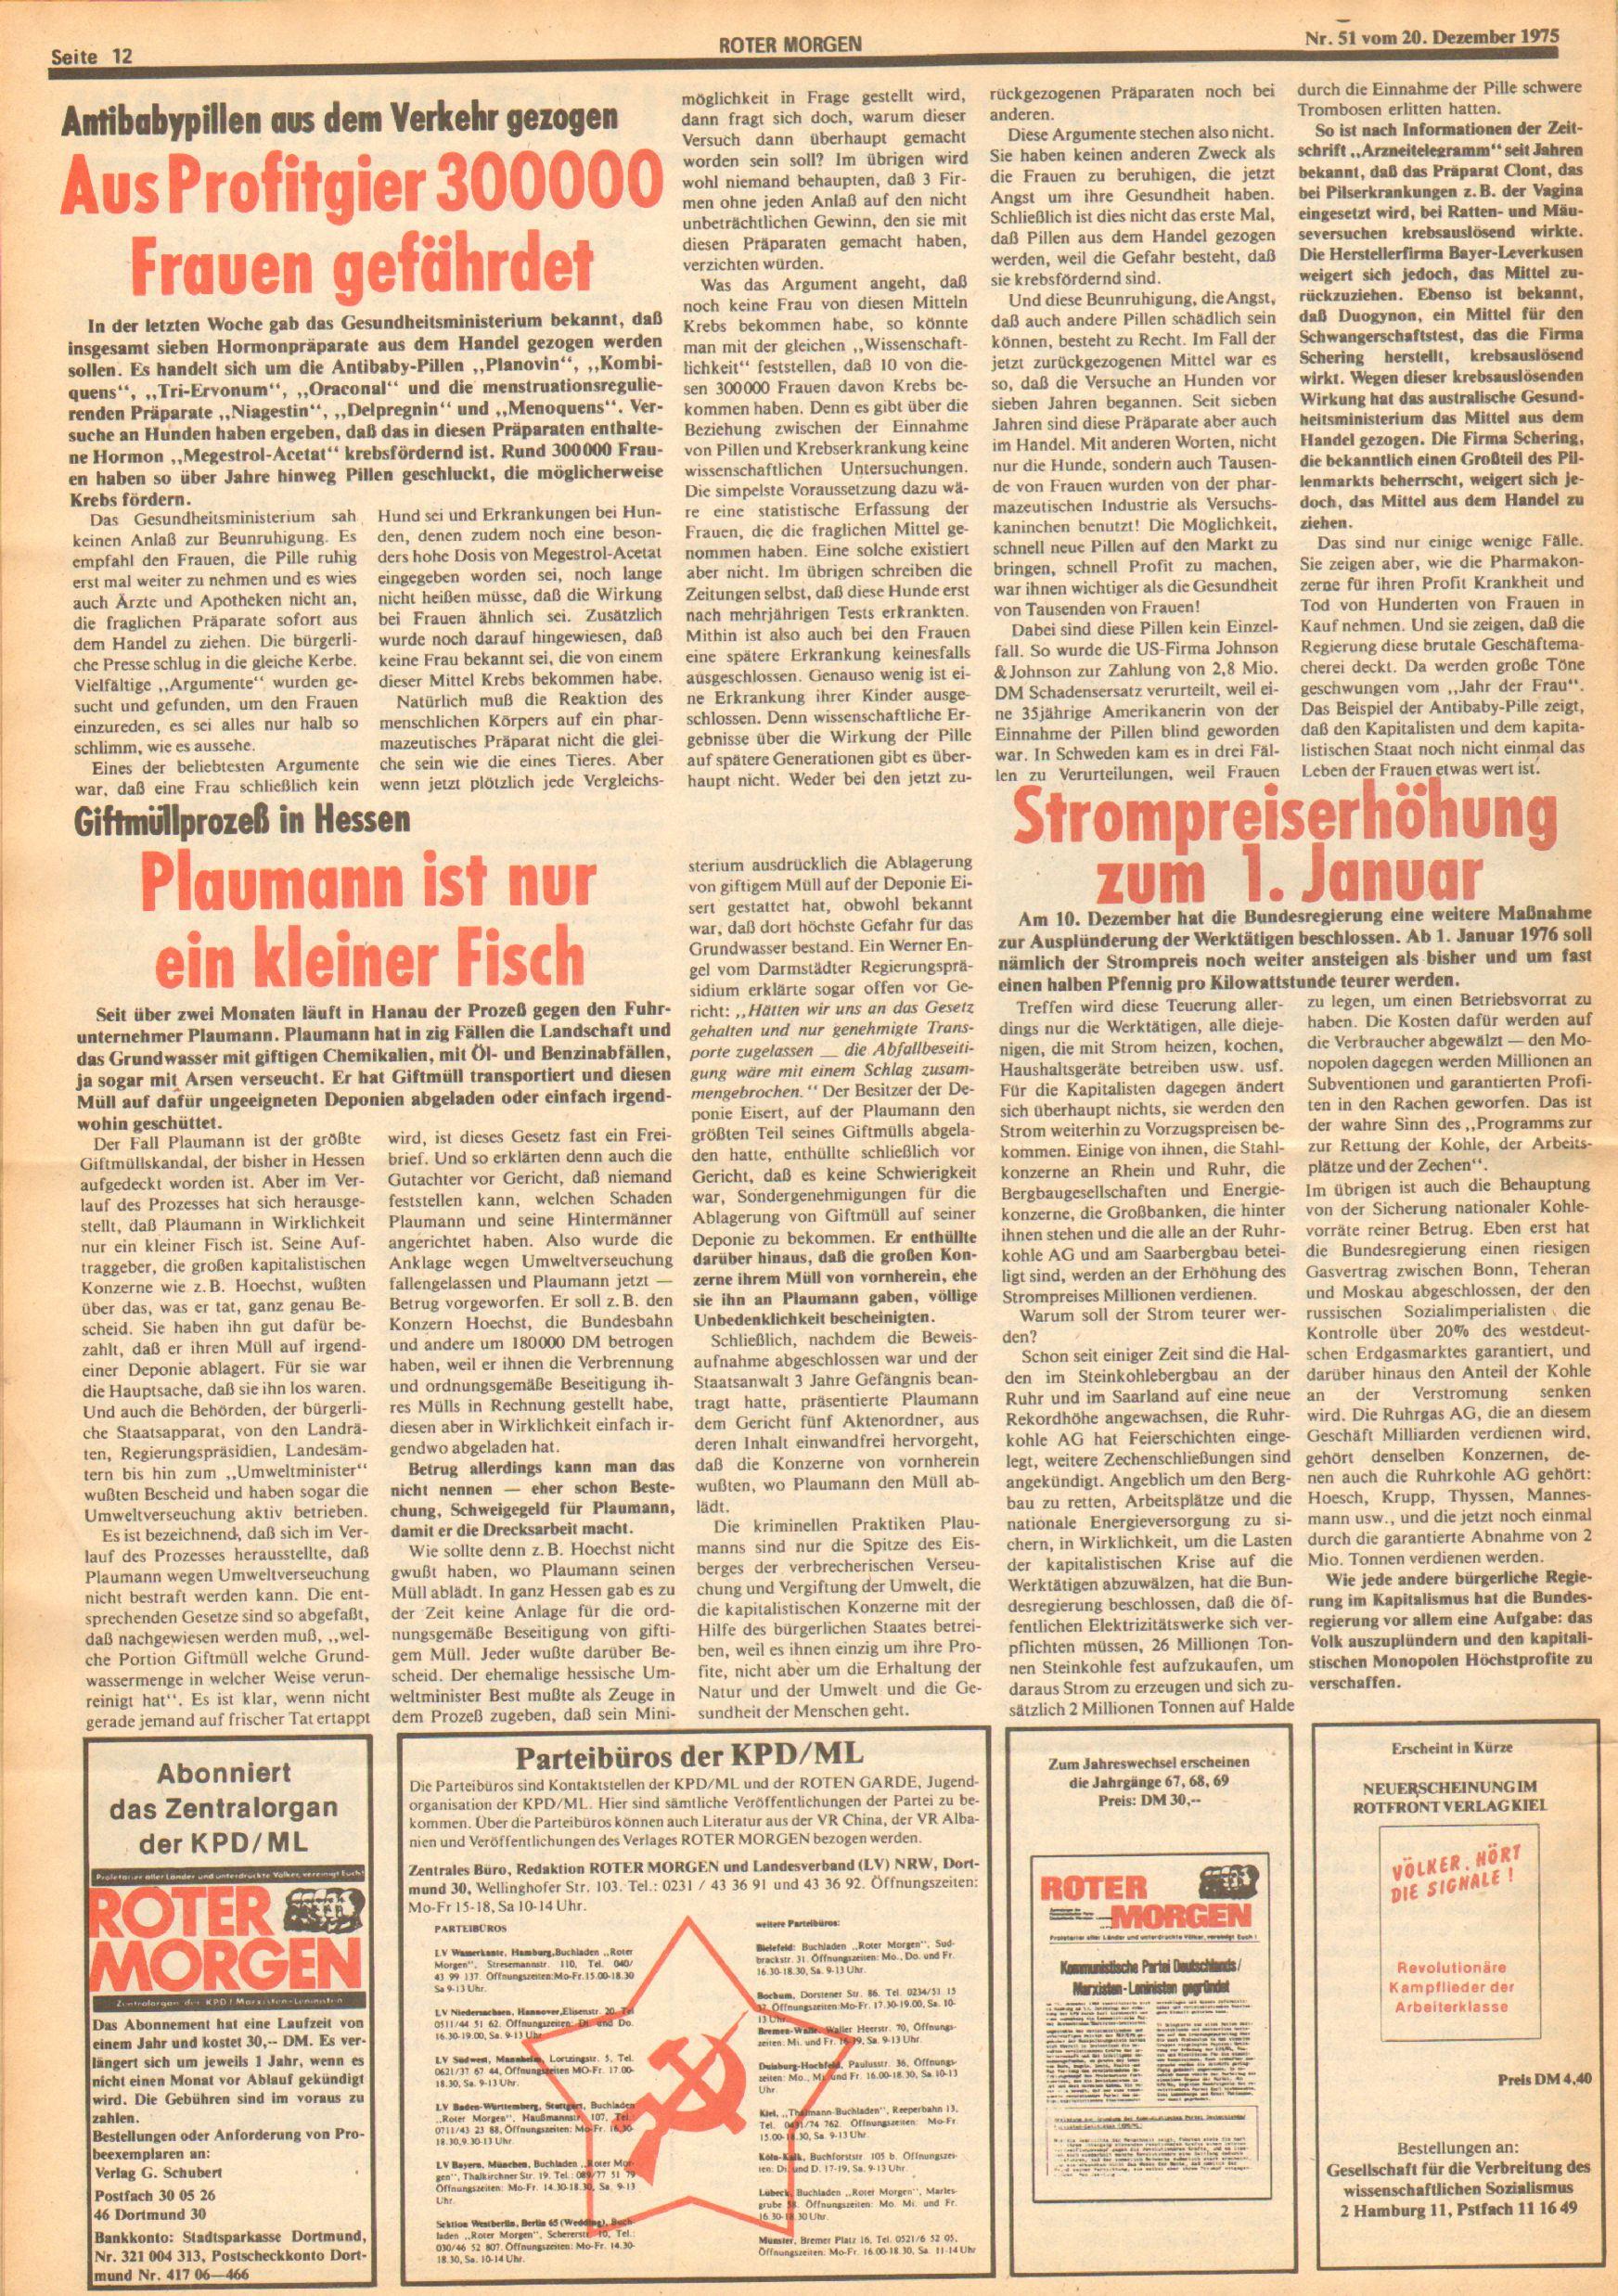 Roter Morgen, 9. Jg., 20. Dezember 1975, Nr. 51, Seite 12